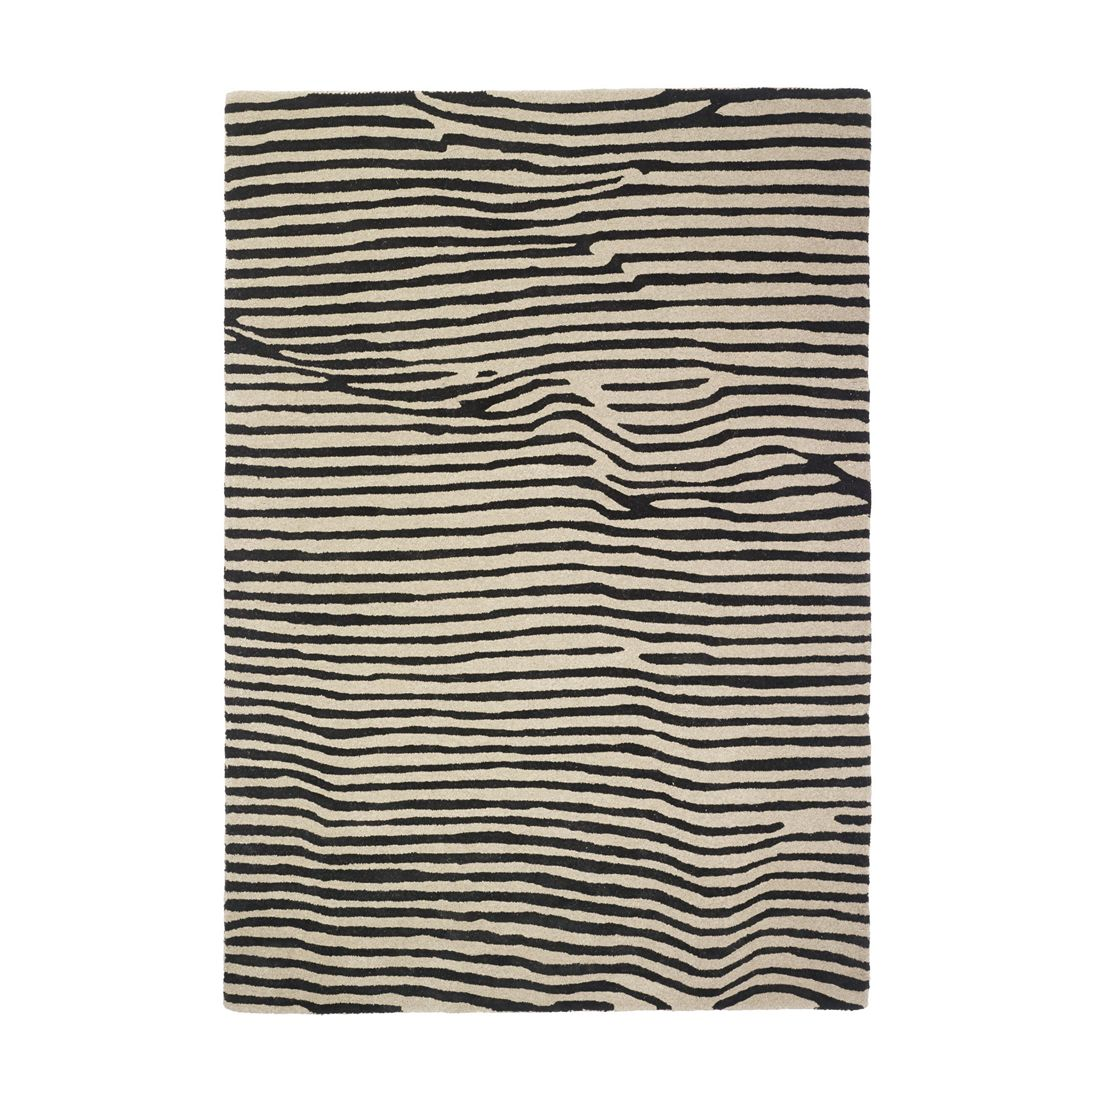 Teppich Andes - Wolle - Schwarz/Grau - 120x180, Pure Day